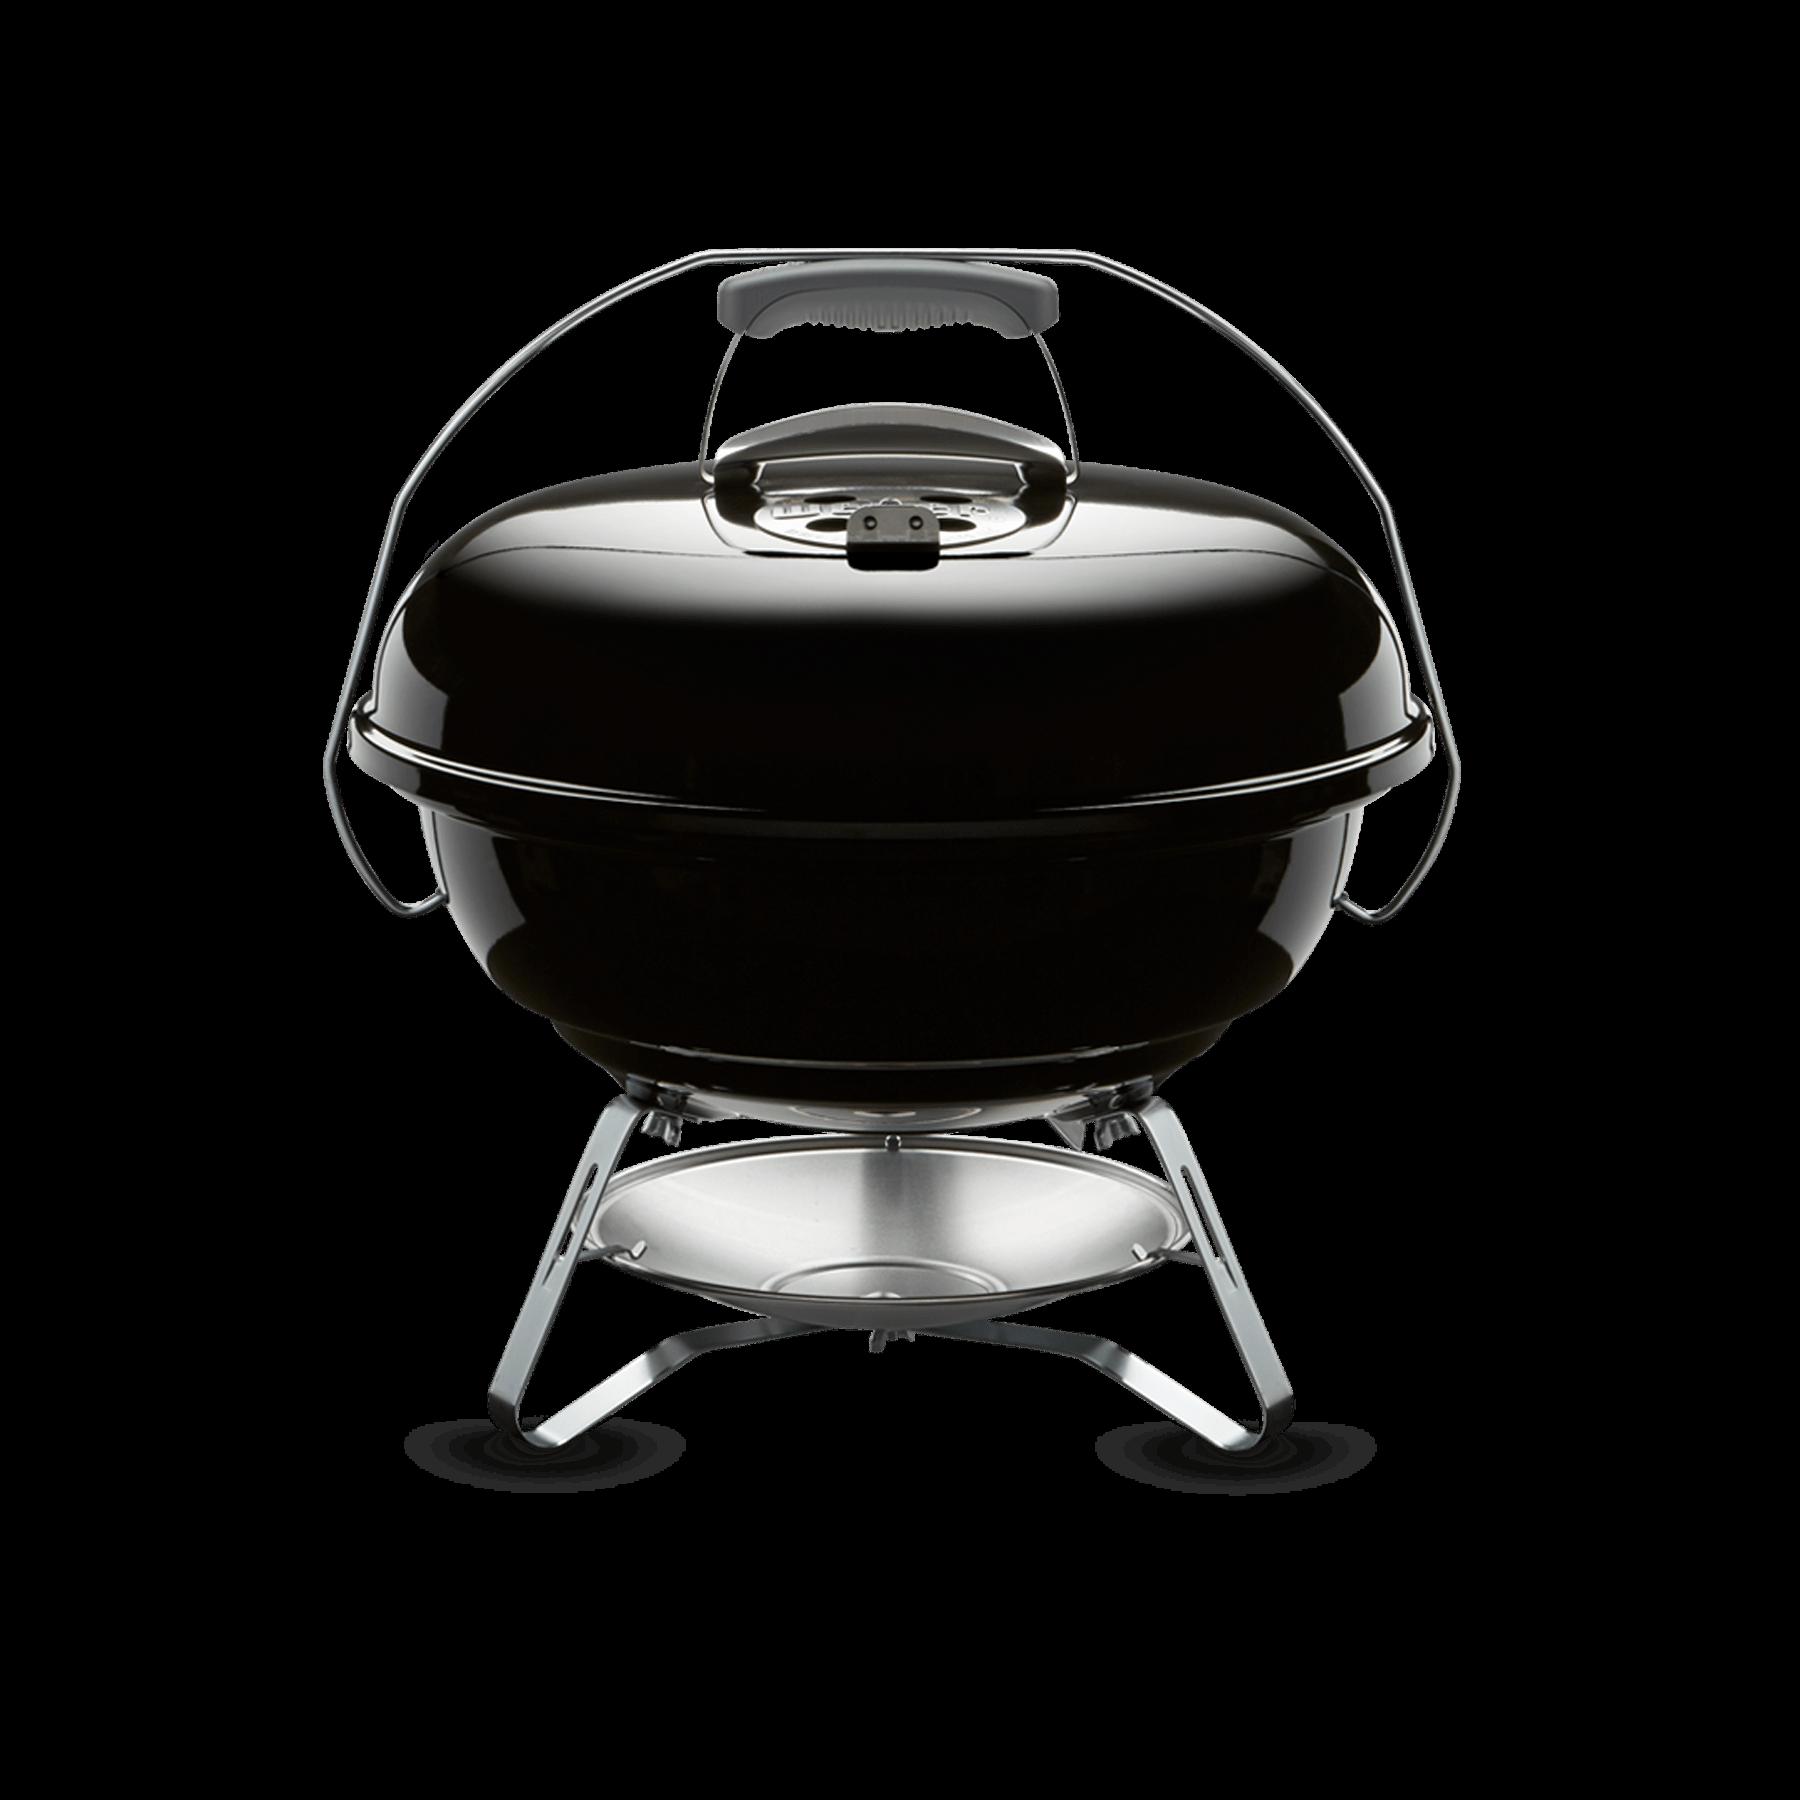 Weber Jumbo Joe Portable Charcoal Grill